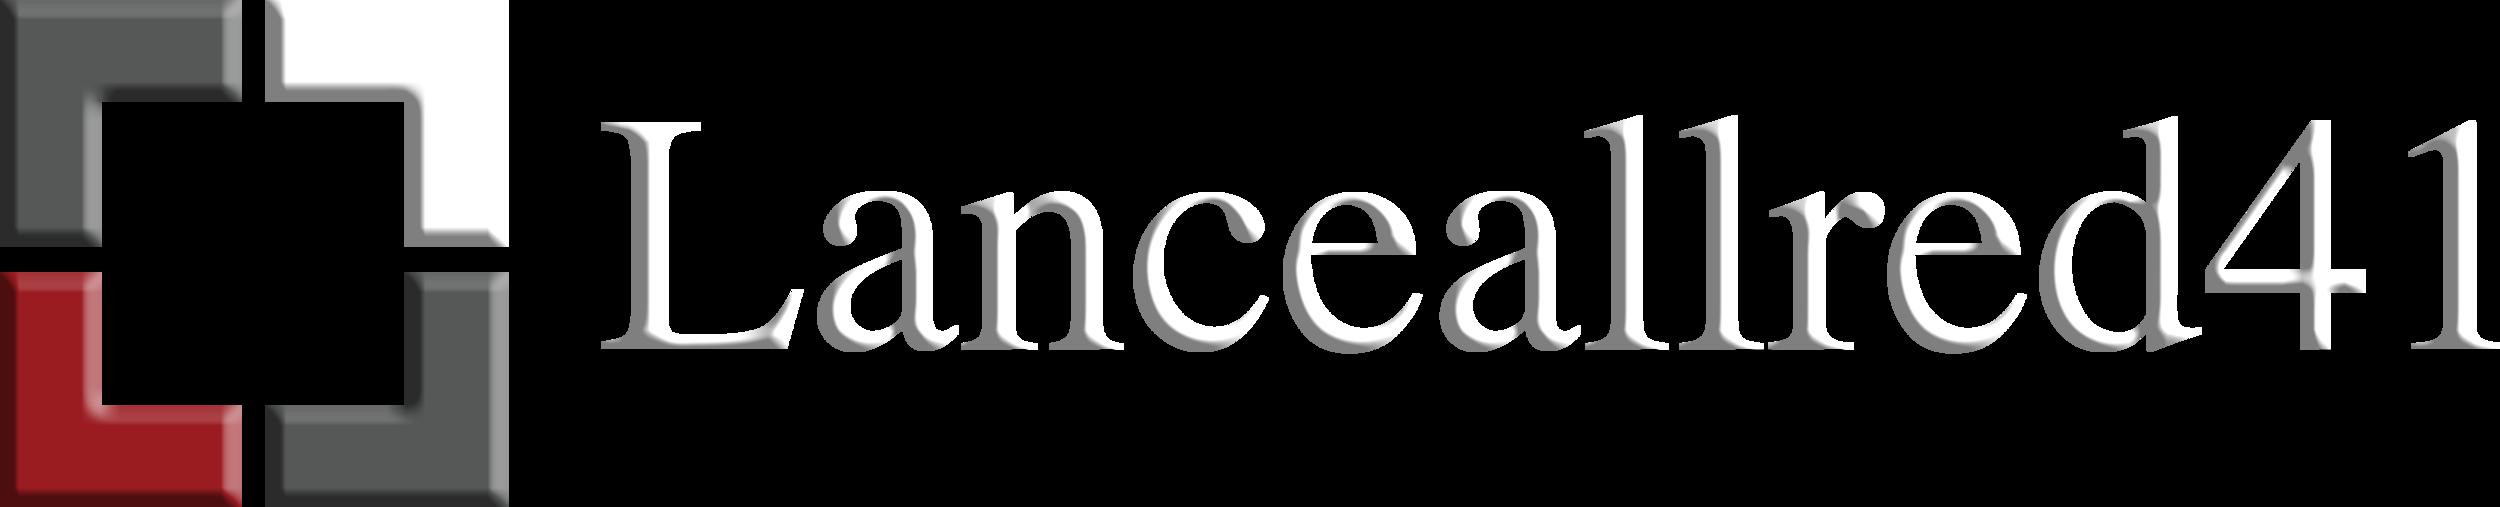 logolanceallred41.png